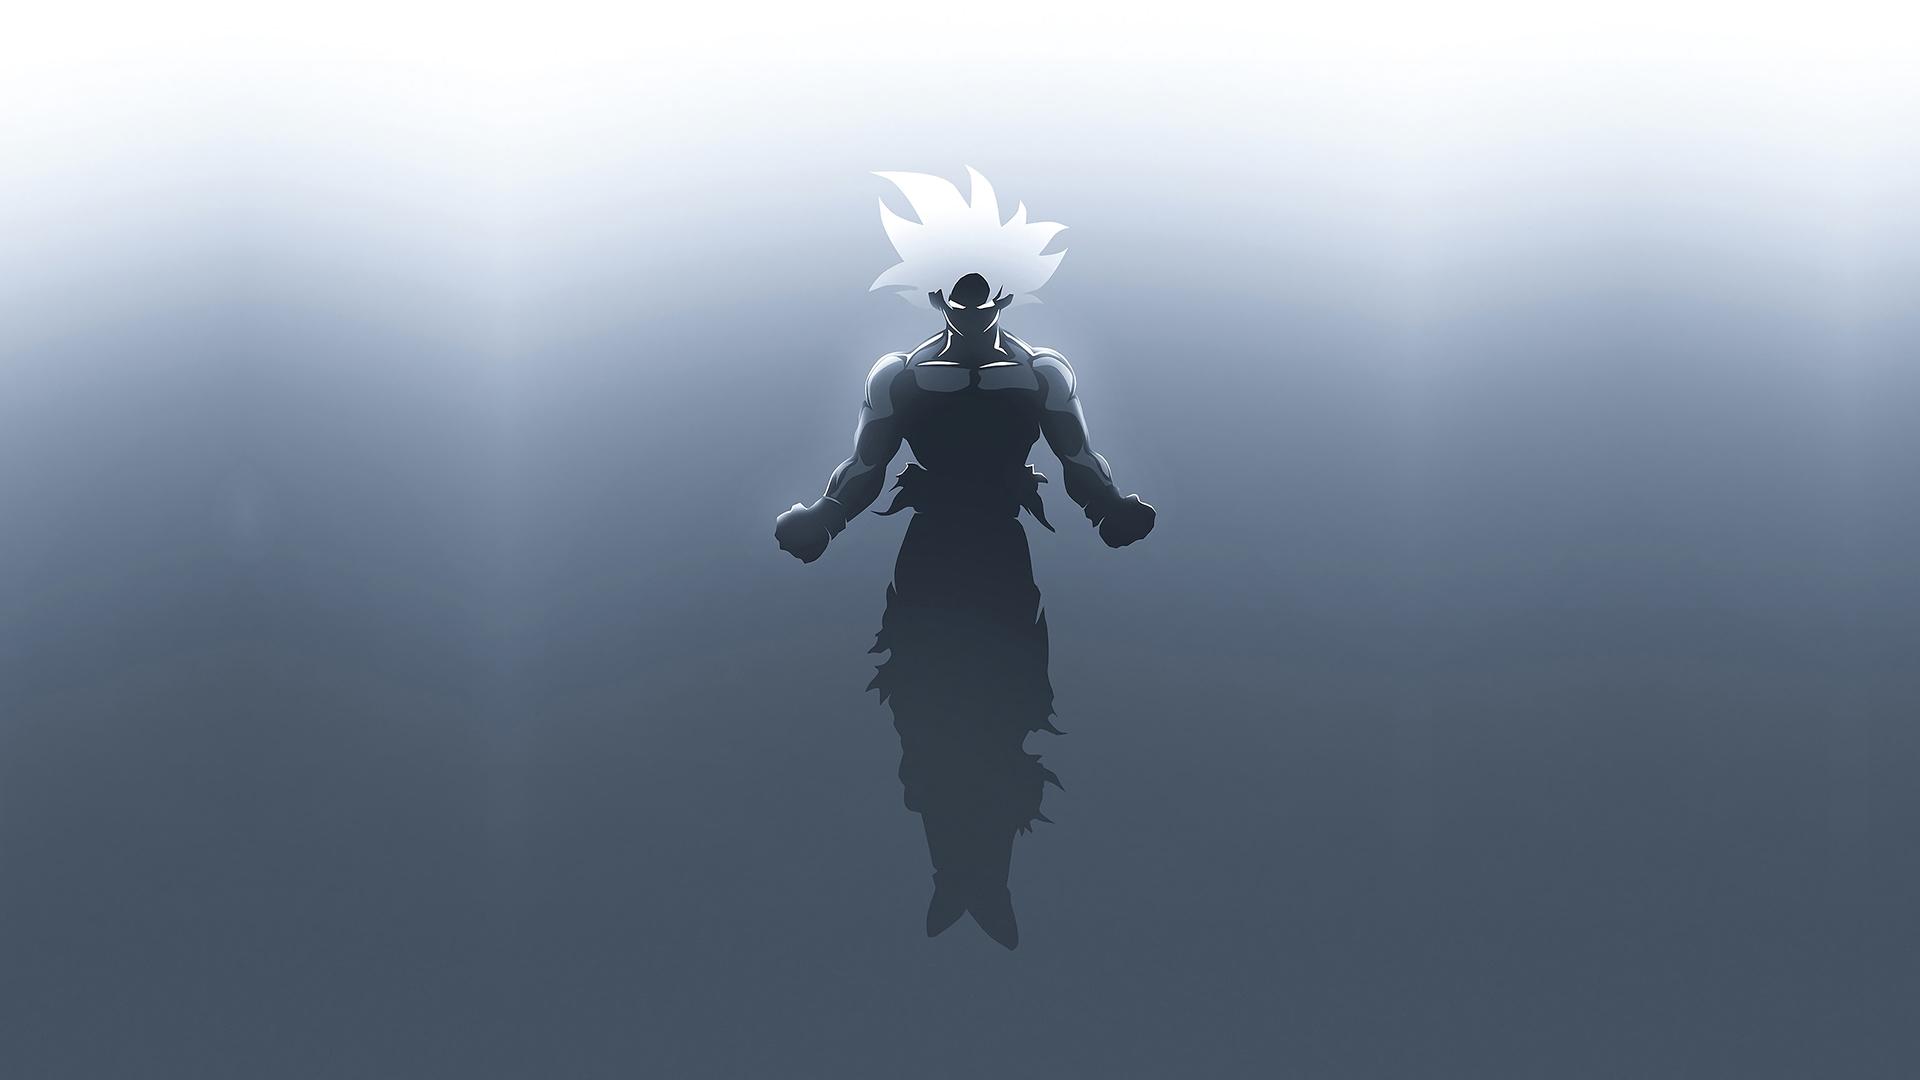 goku-in-dragon-ball-super-minimalism-8u.jpg